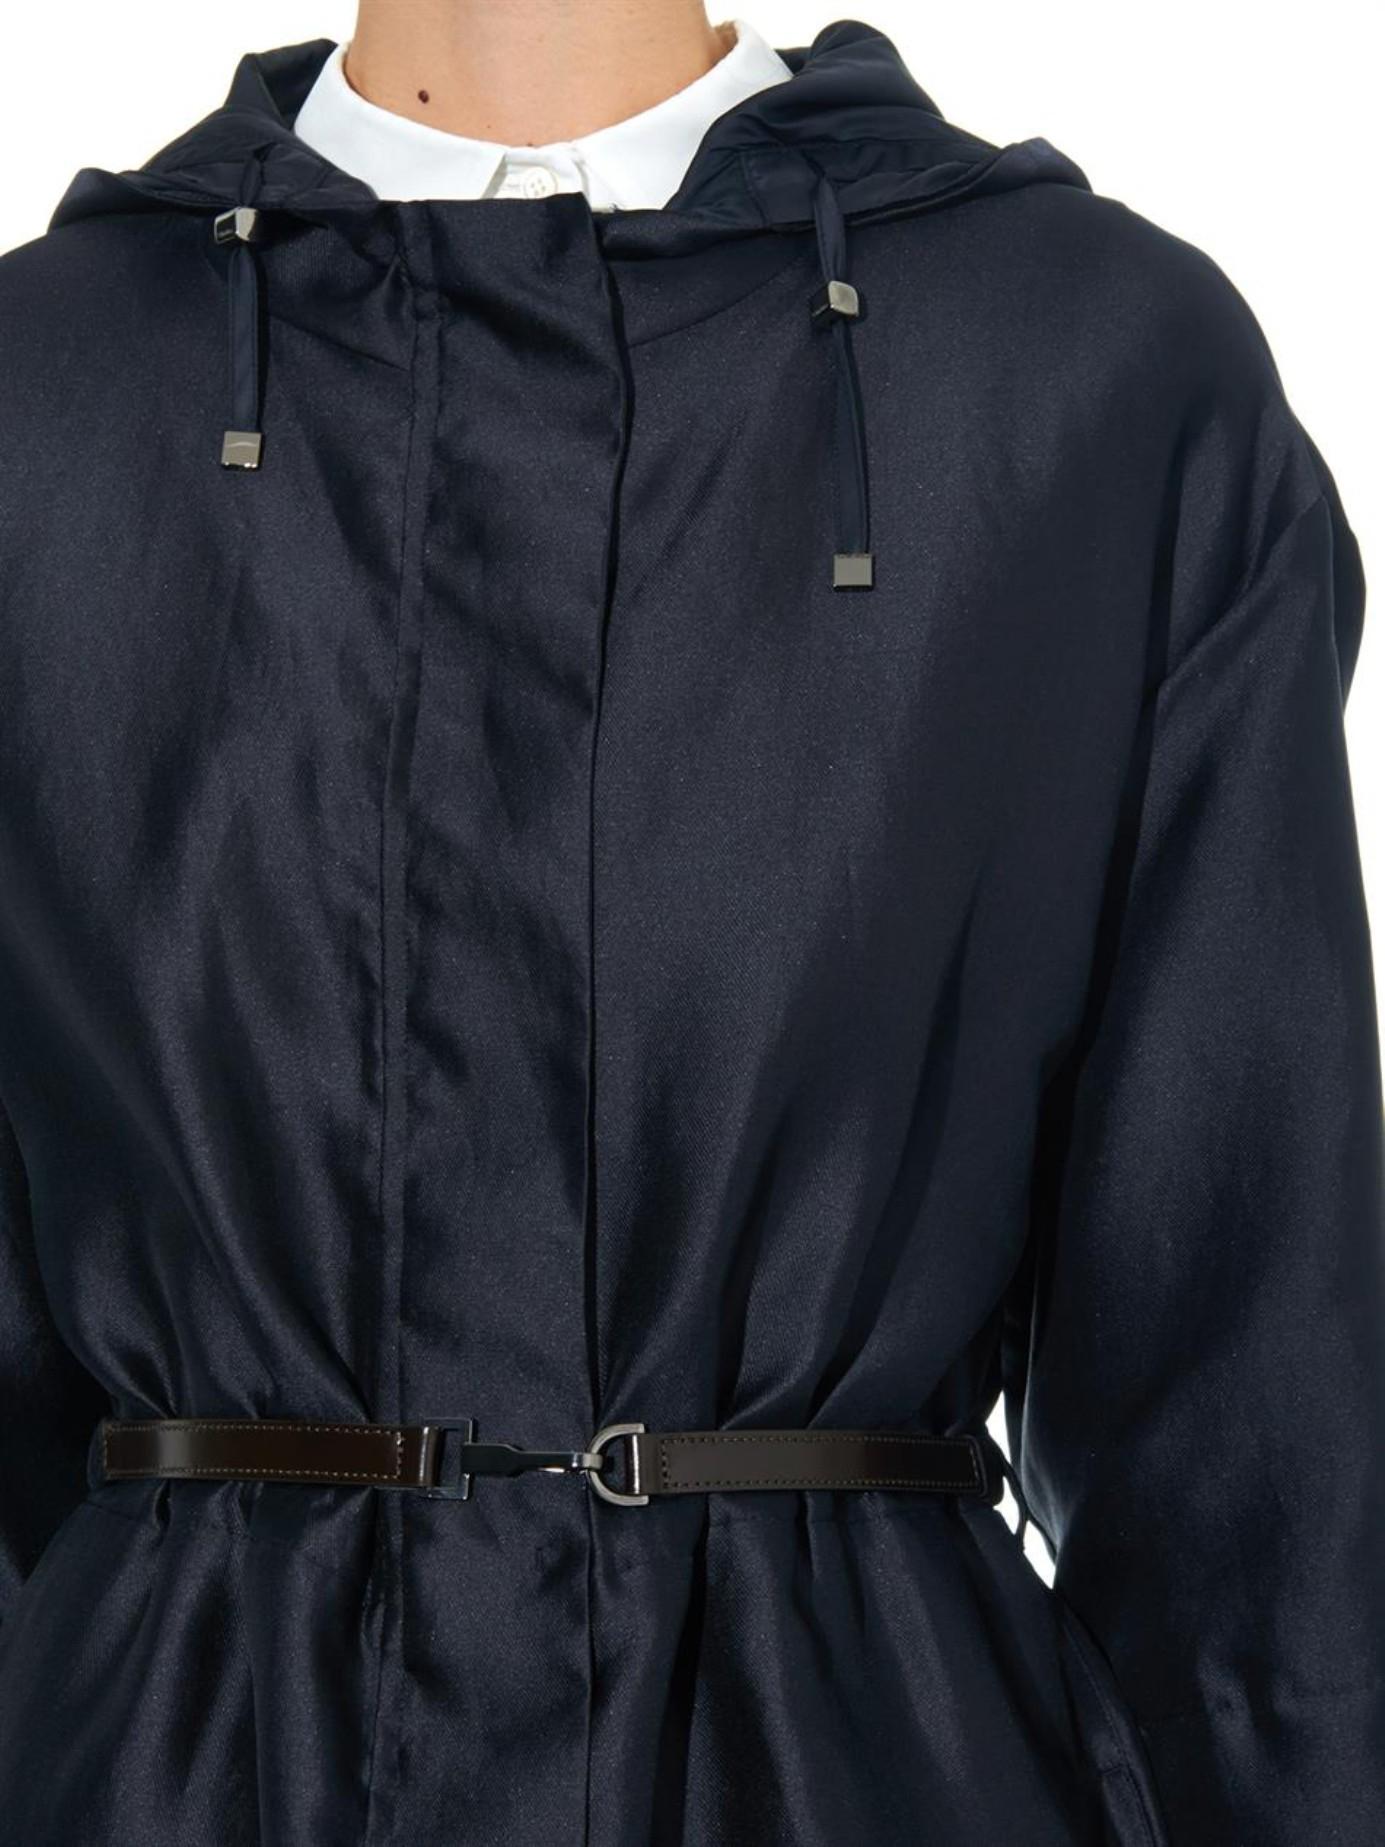 S Max Mara Soirc Reversible Coat In Blue Lyst